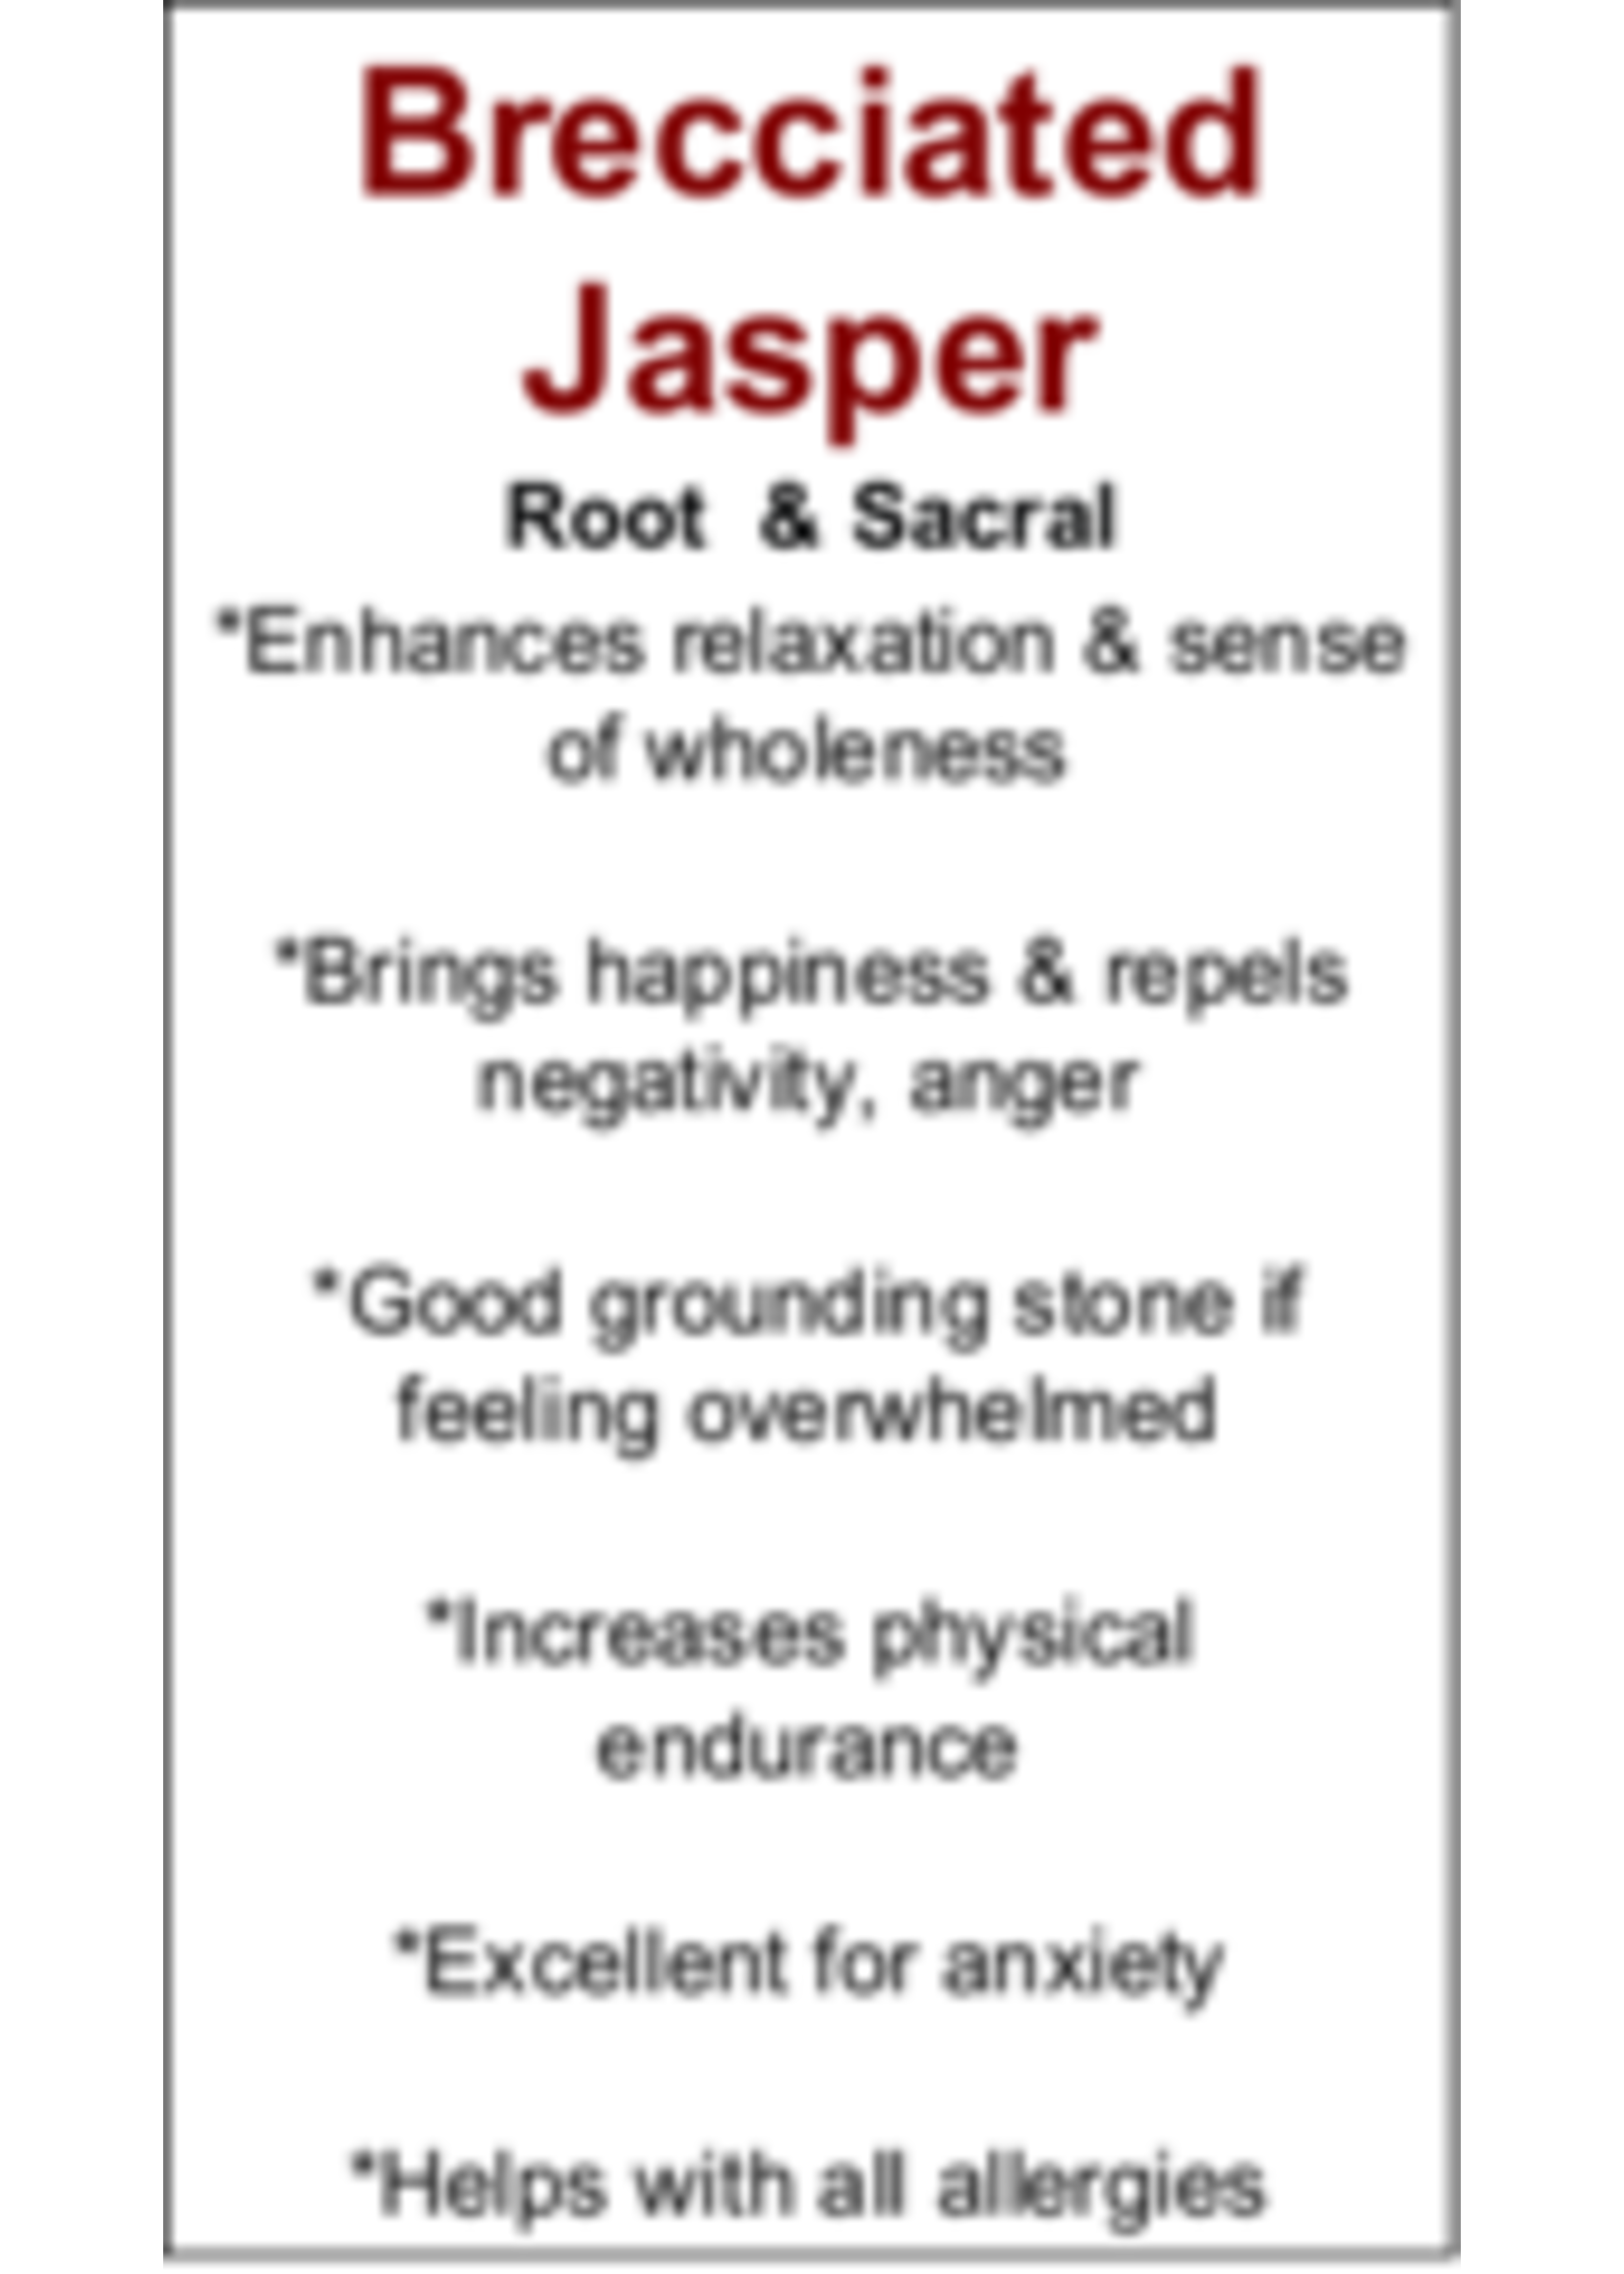 Brecciated Jasper Cards - Box of 250